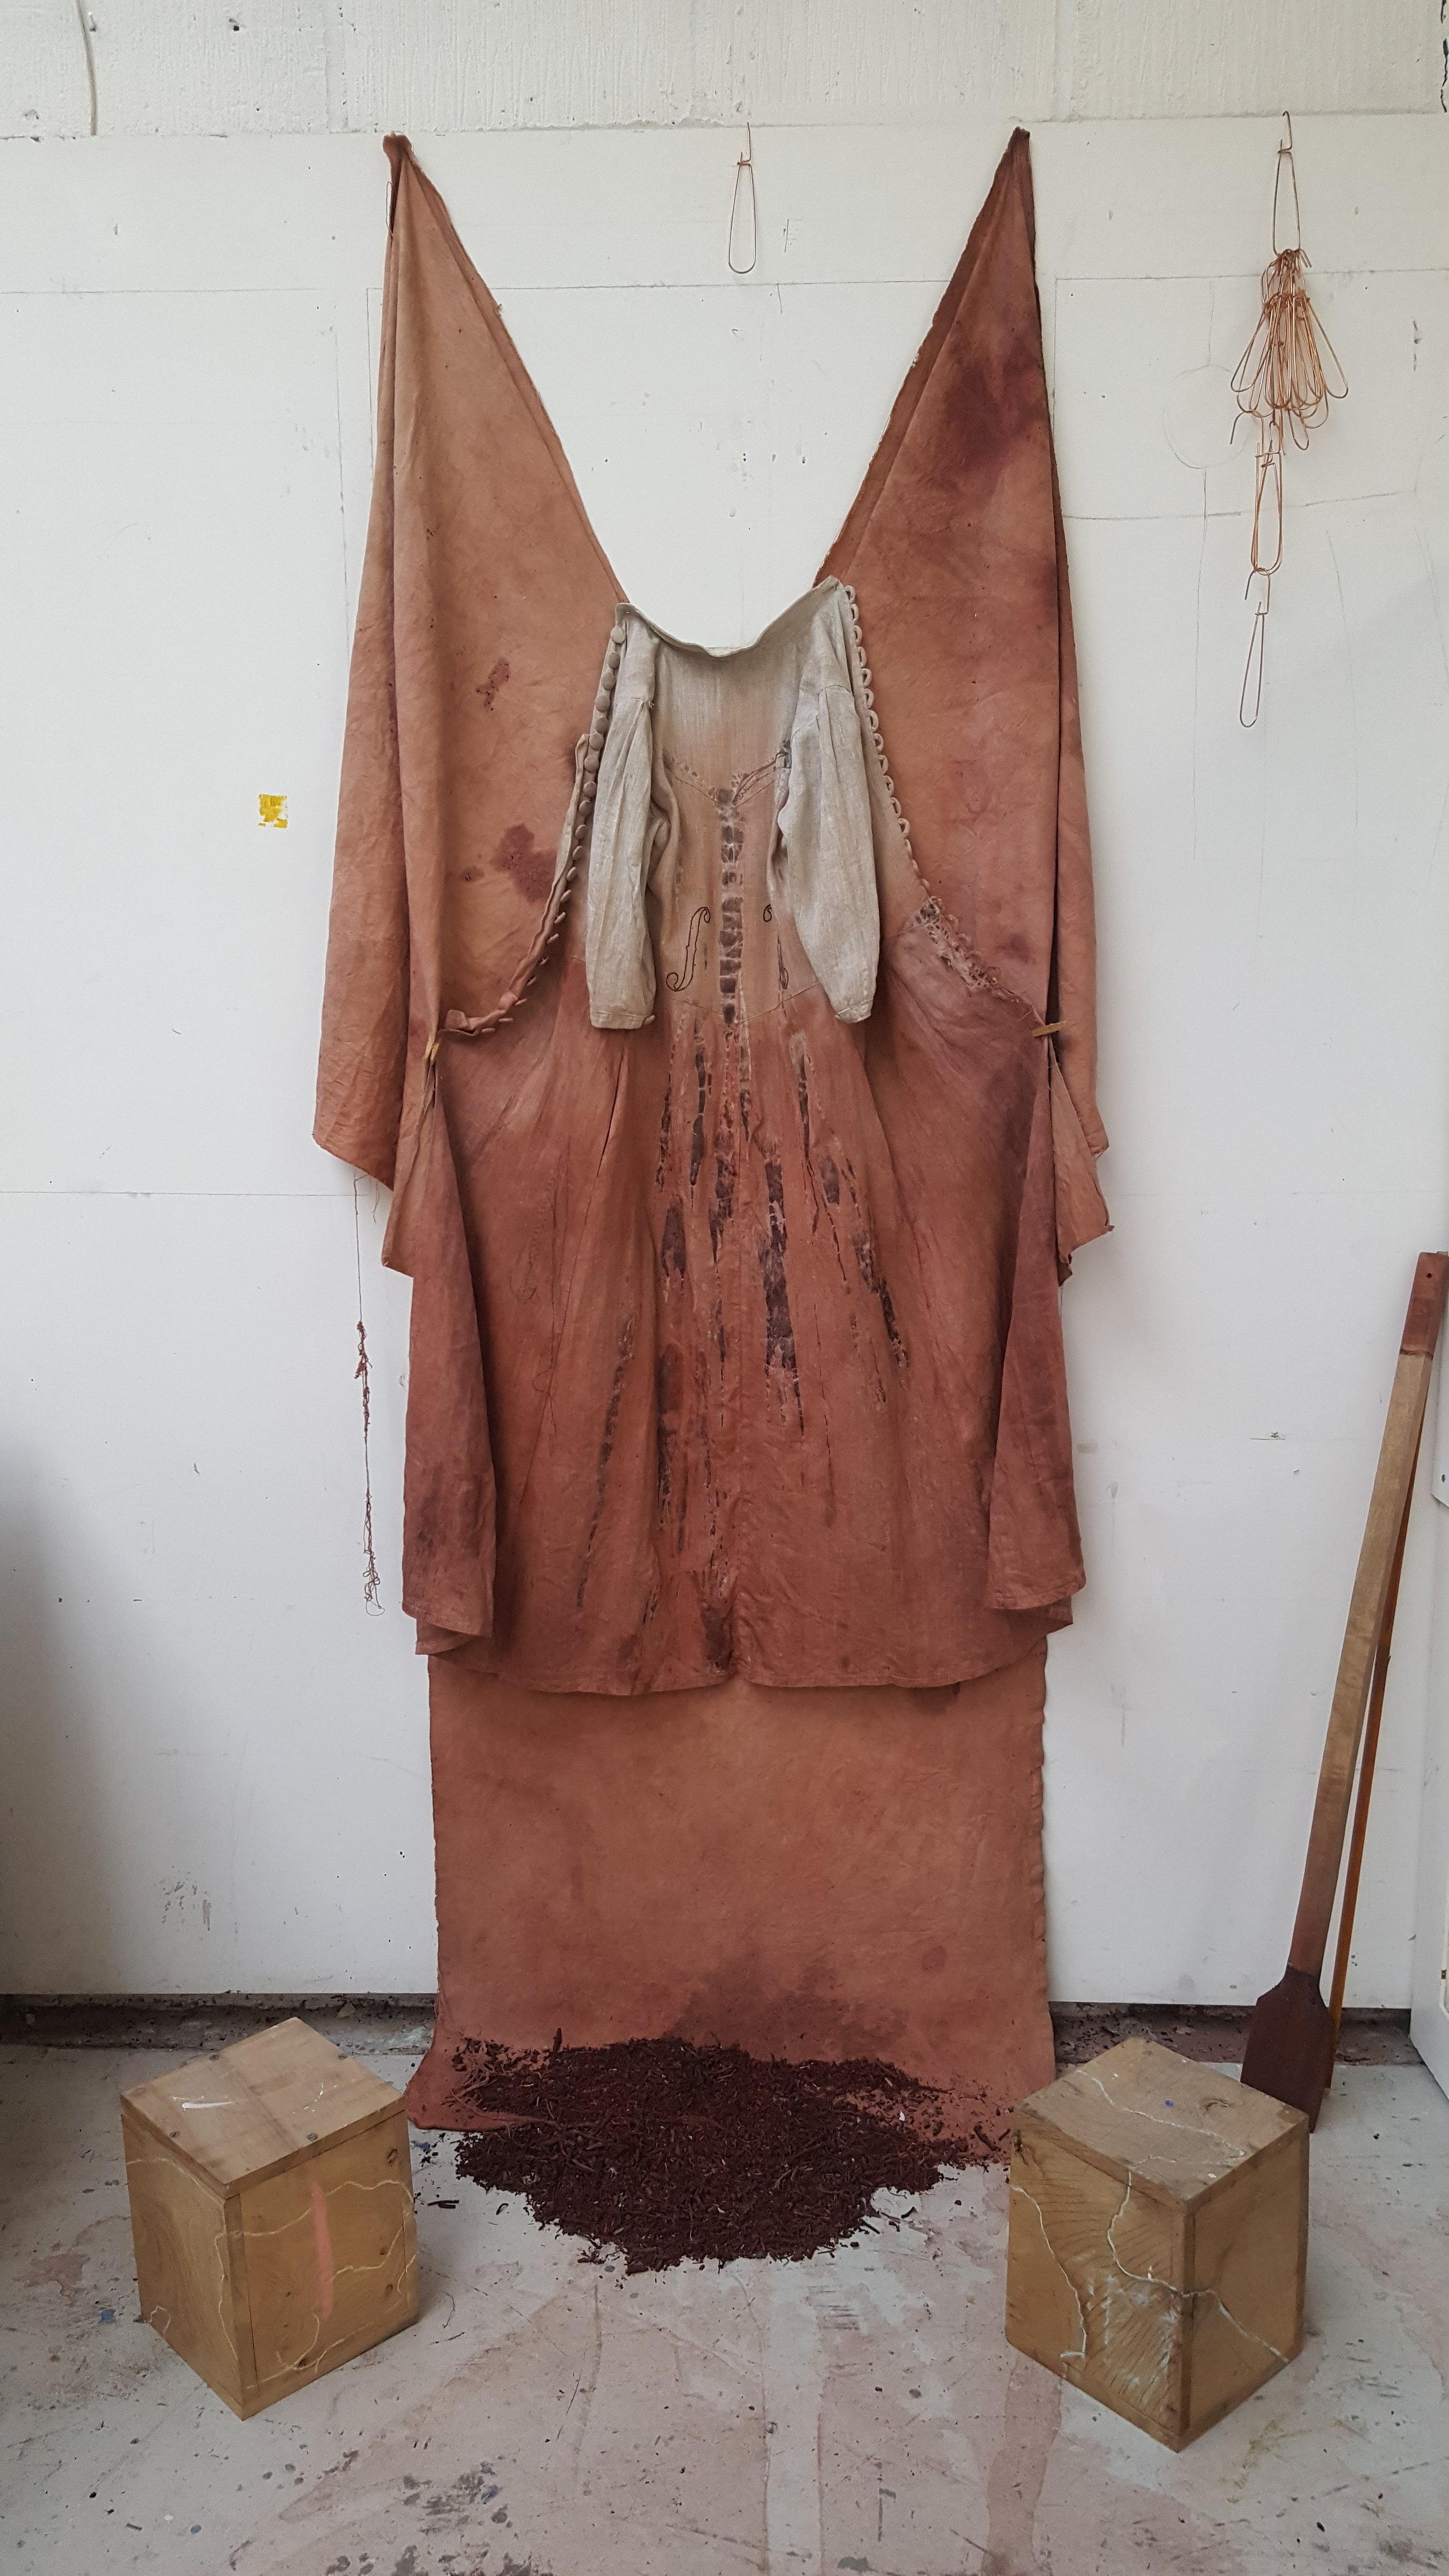 Dress, by Suki Jobson